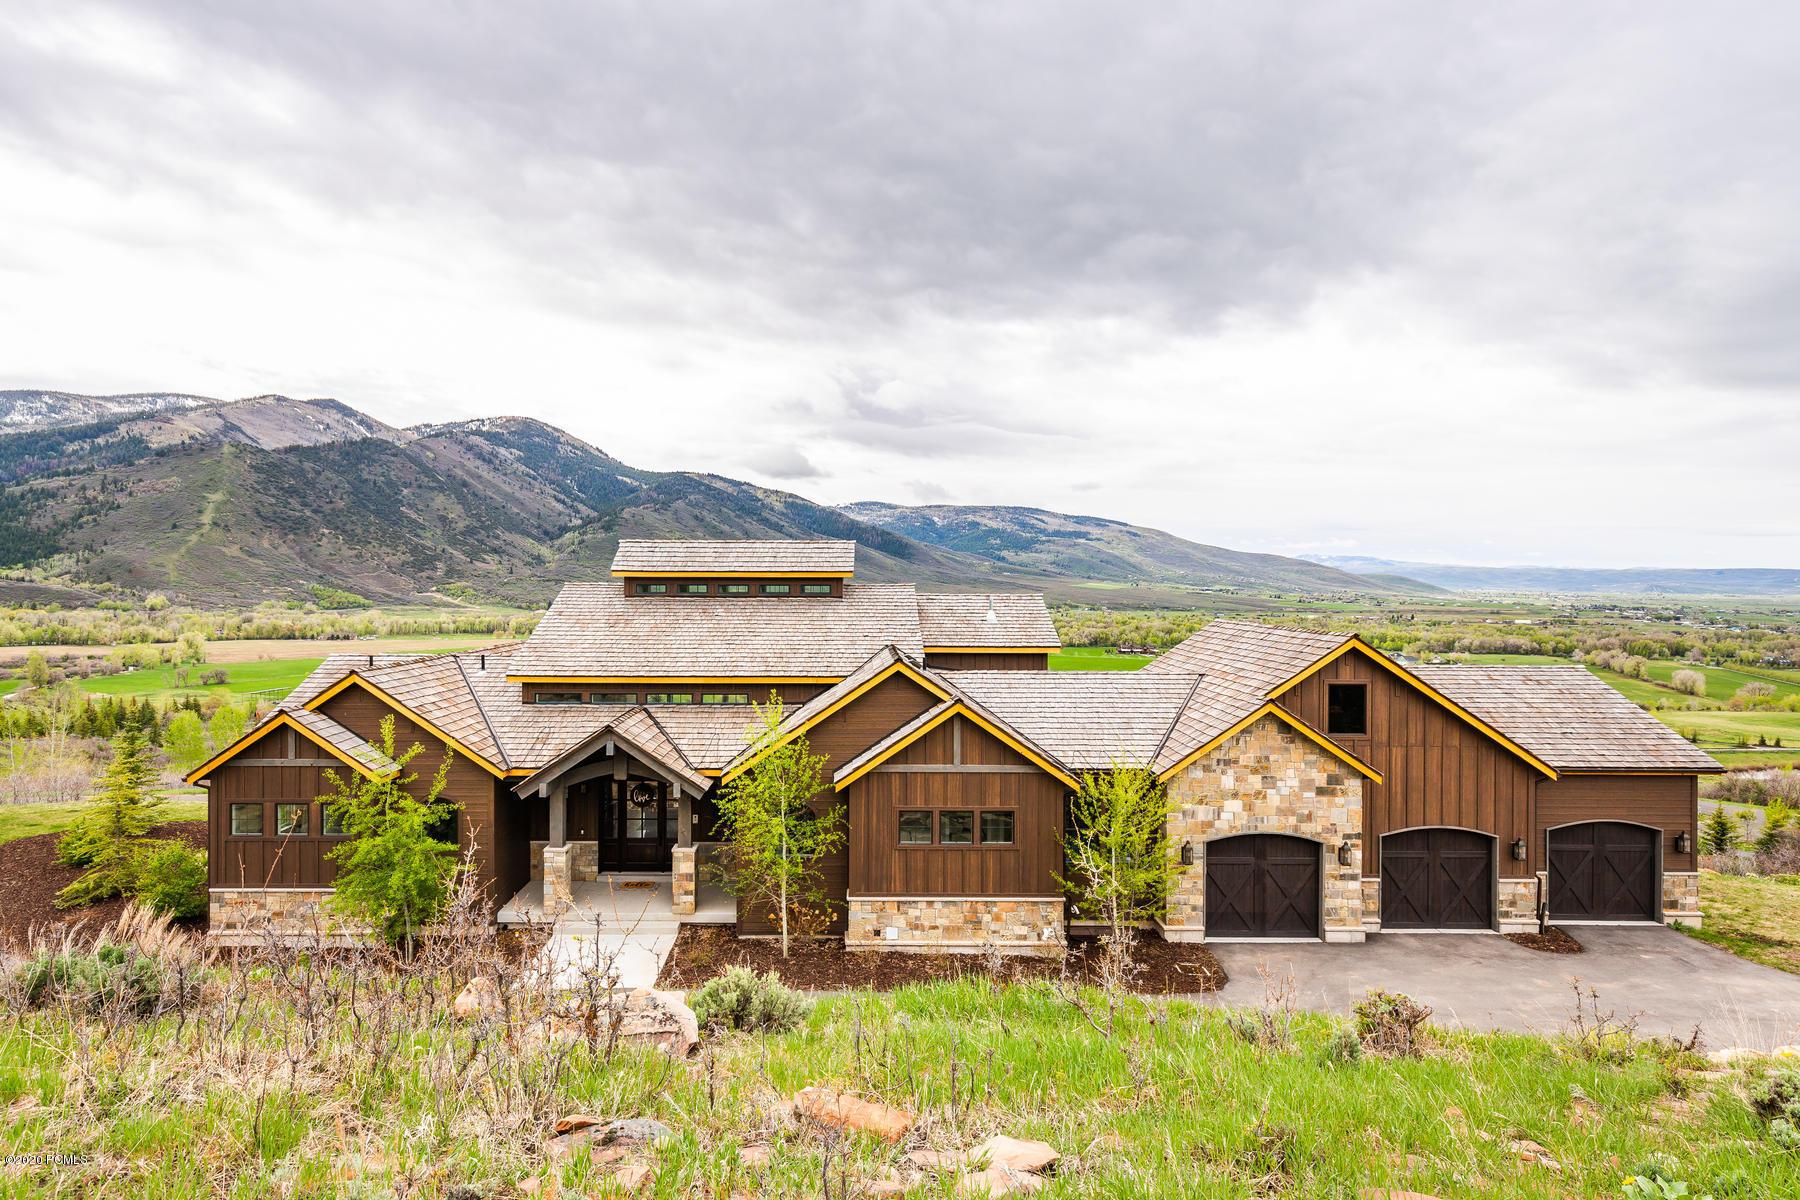 5968 Maple Ridge Trail, Oakley, Utah 84055, 6 Bedrooms Bedrooms, ,7 BathroomsBathrooms,Single Family,For Sale,Maple Ridge,20190109112430415765000000